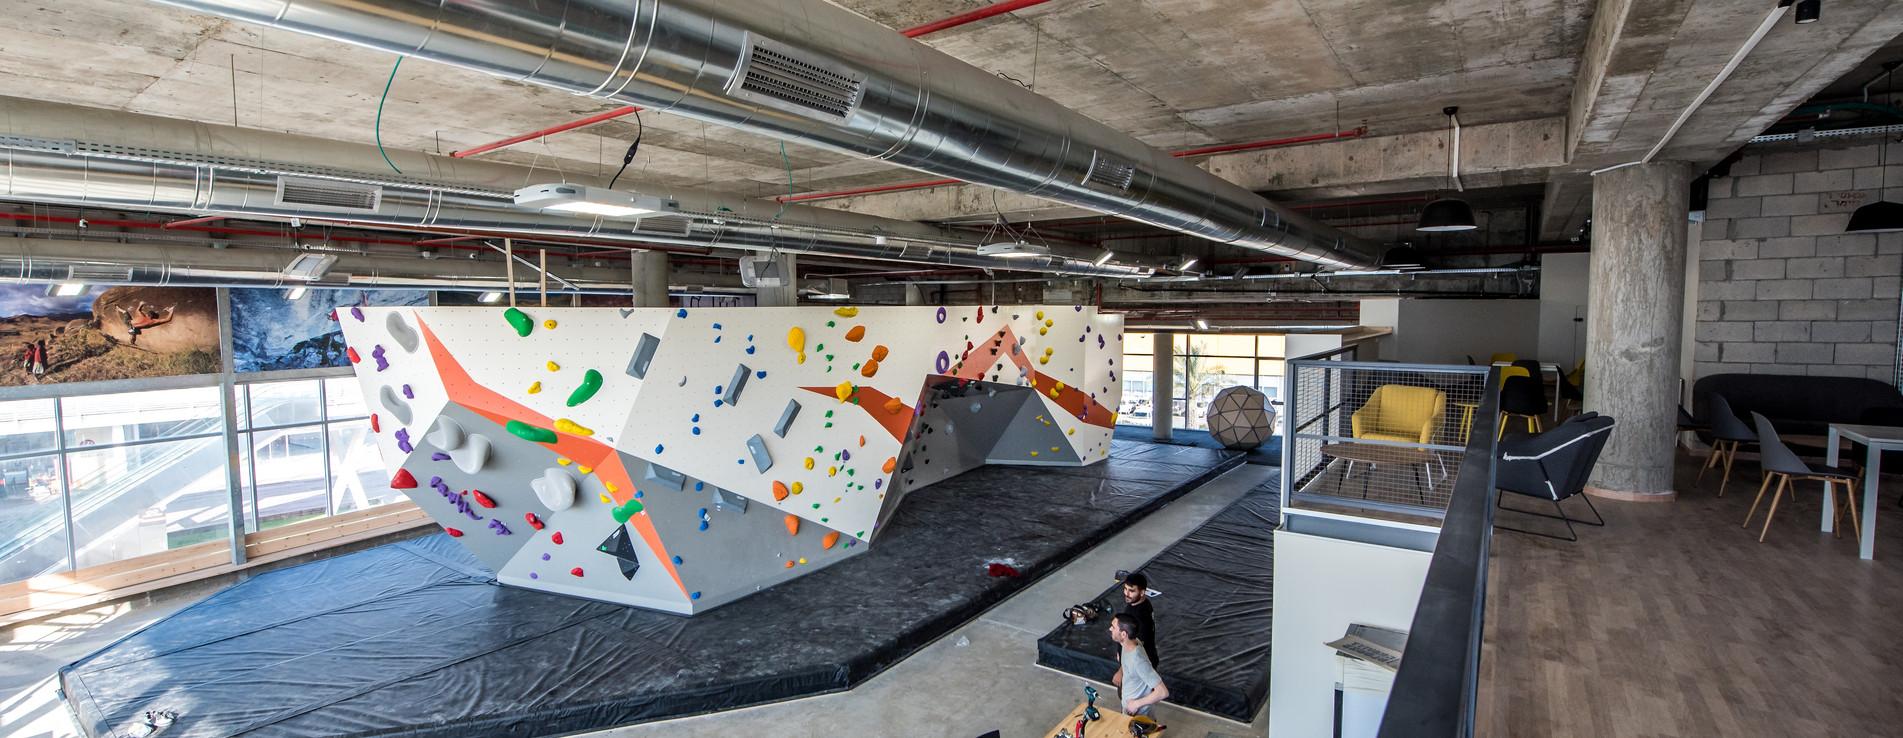 "hakir climbing gym - ""מועדון טיפוס ""הקיר"